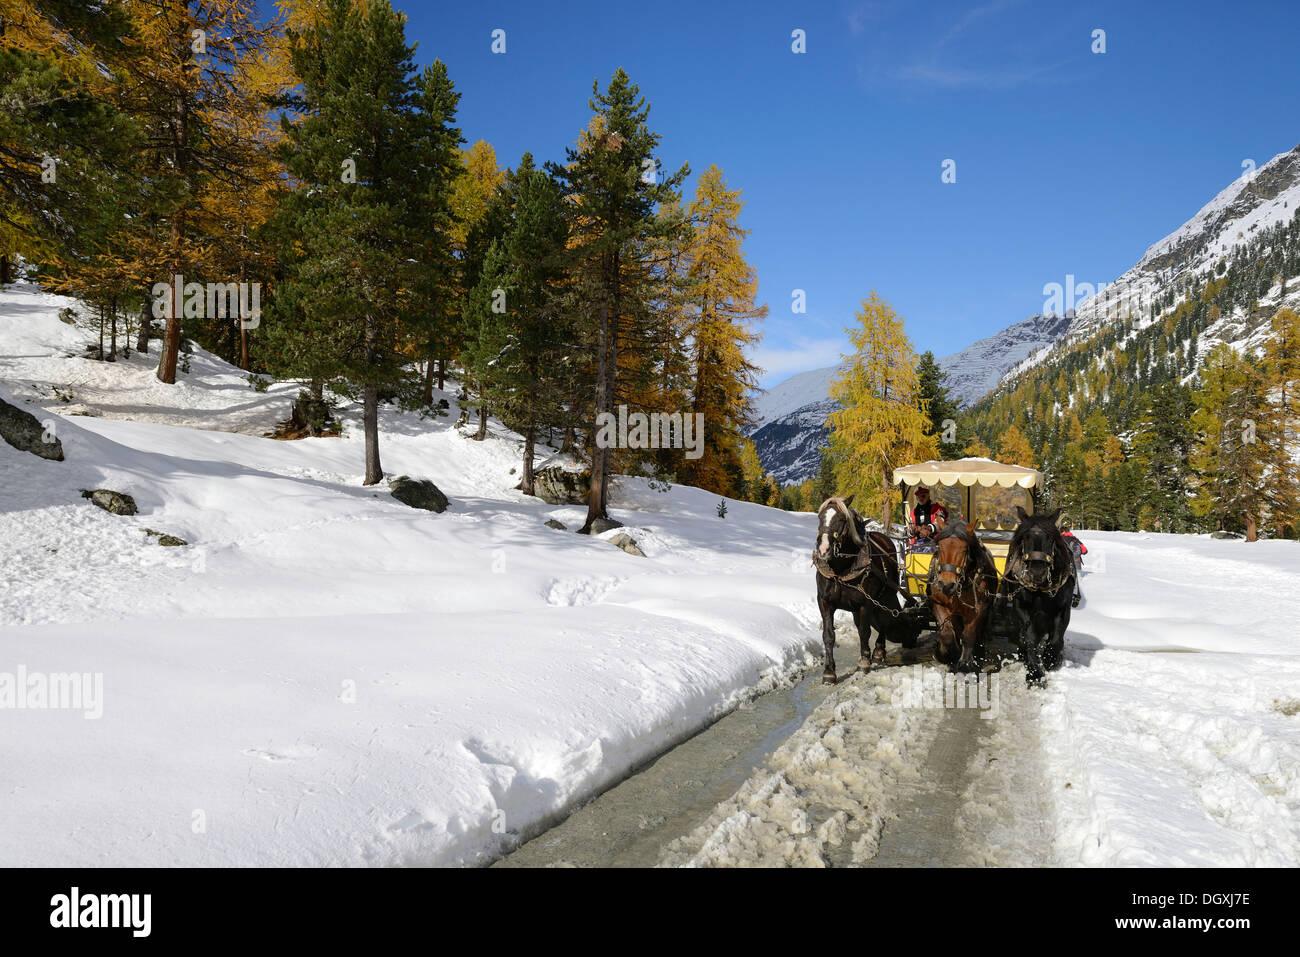 Horse-drawn carriage, Roseg valley, autumnal landscape, Pontresina, canton of Grisons, Engadin, Switzerland, Europe - Stock Image